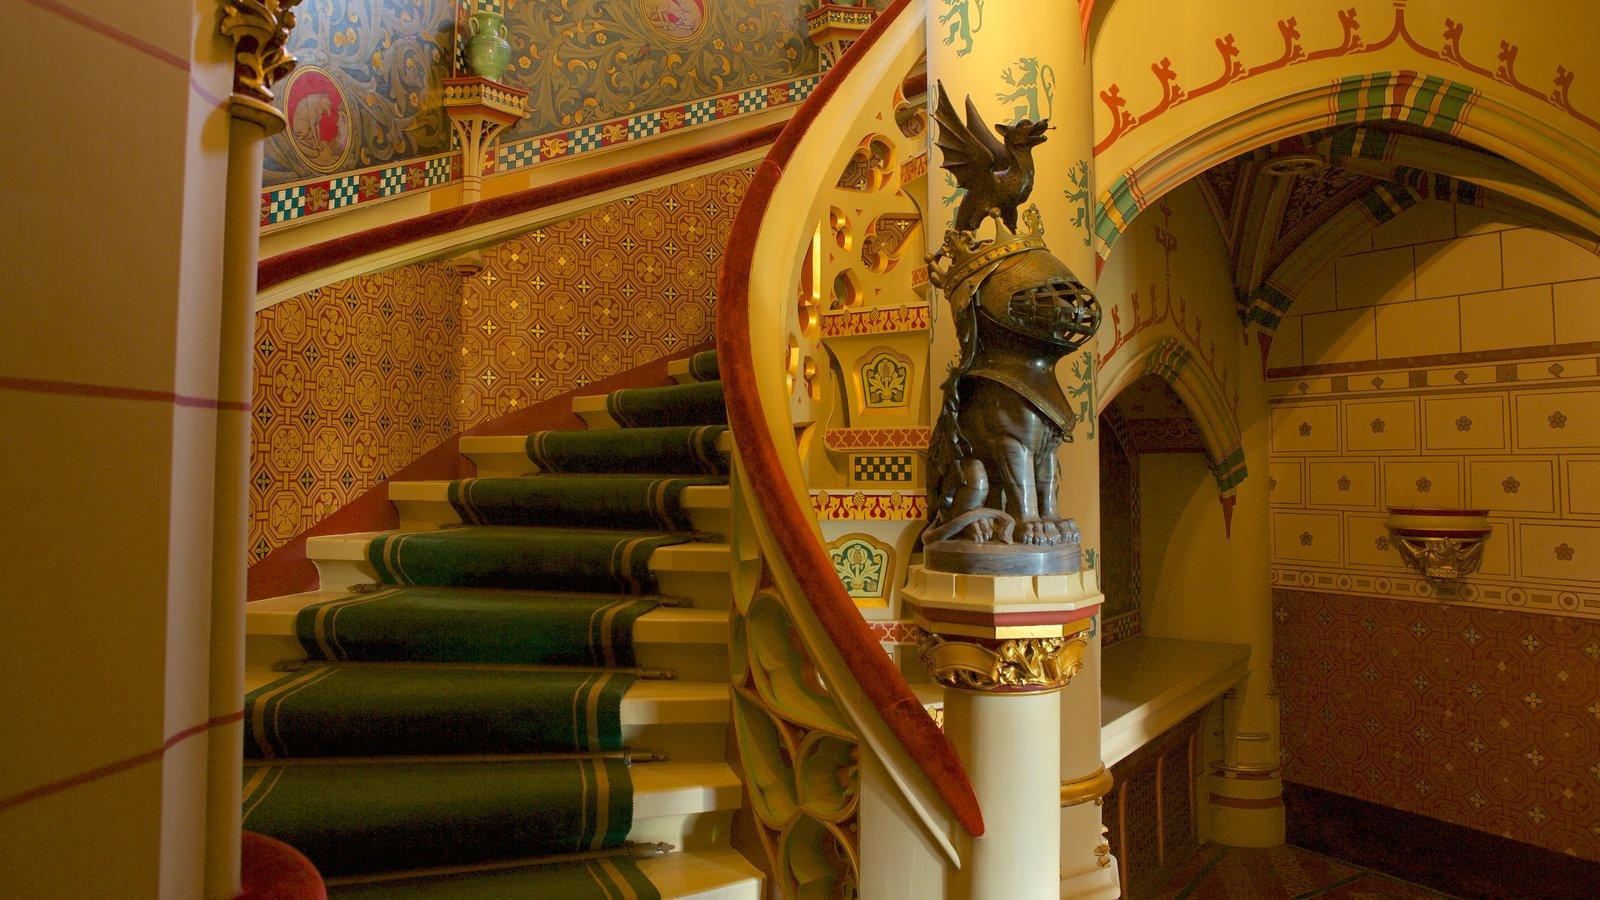 Castelo de Cardiff mostrando arquitetura de patrimônio, elementos de patrimônio e vistas internas